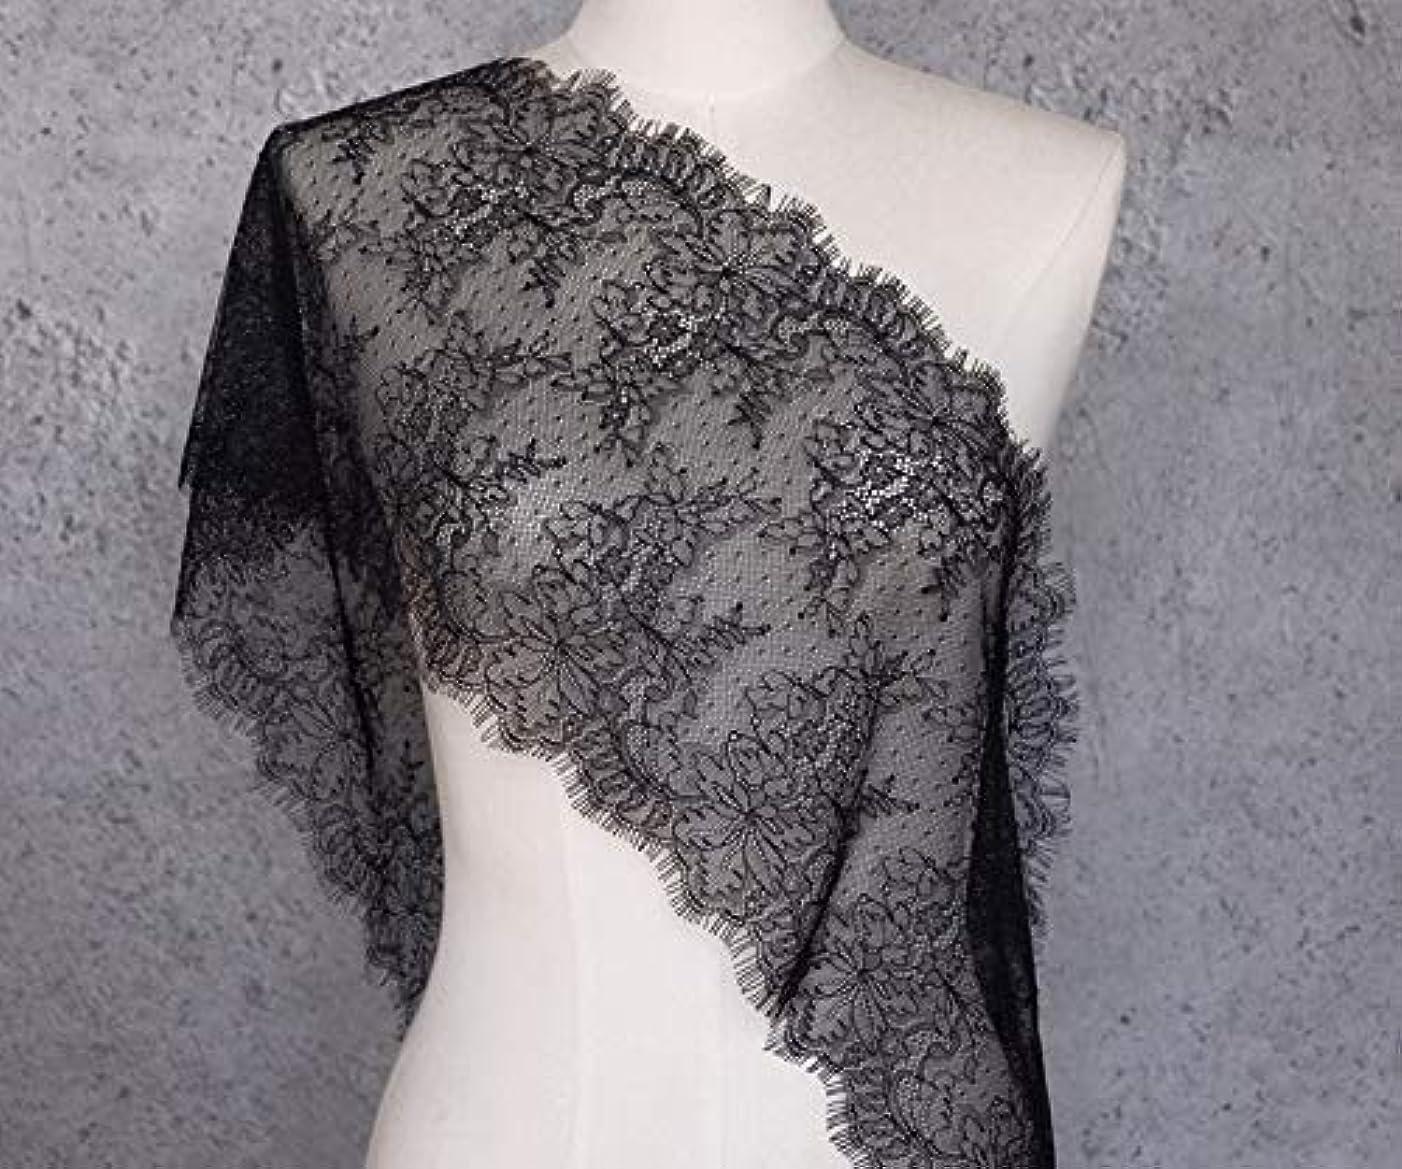 ALE14 Lace Fabric Eyelash Chantilly Floral Bridal/Wedding Dress Flower Table Cloth DIY Crafts Scallop Trim Applique Curtain 300cm x 23cm (Black)